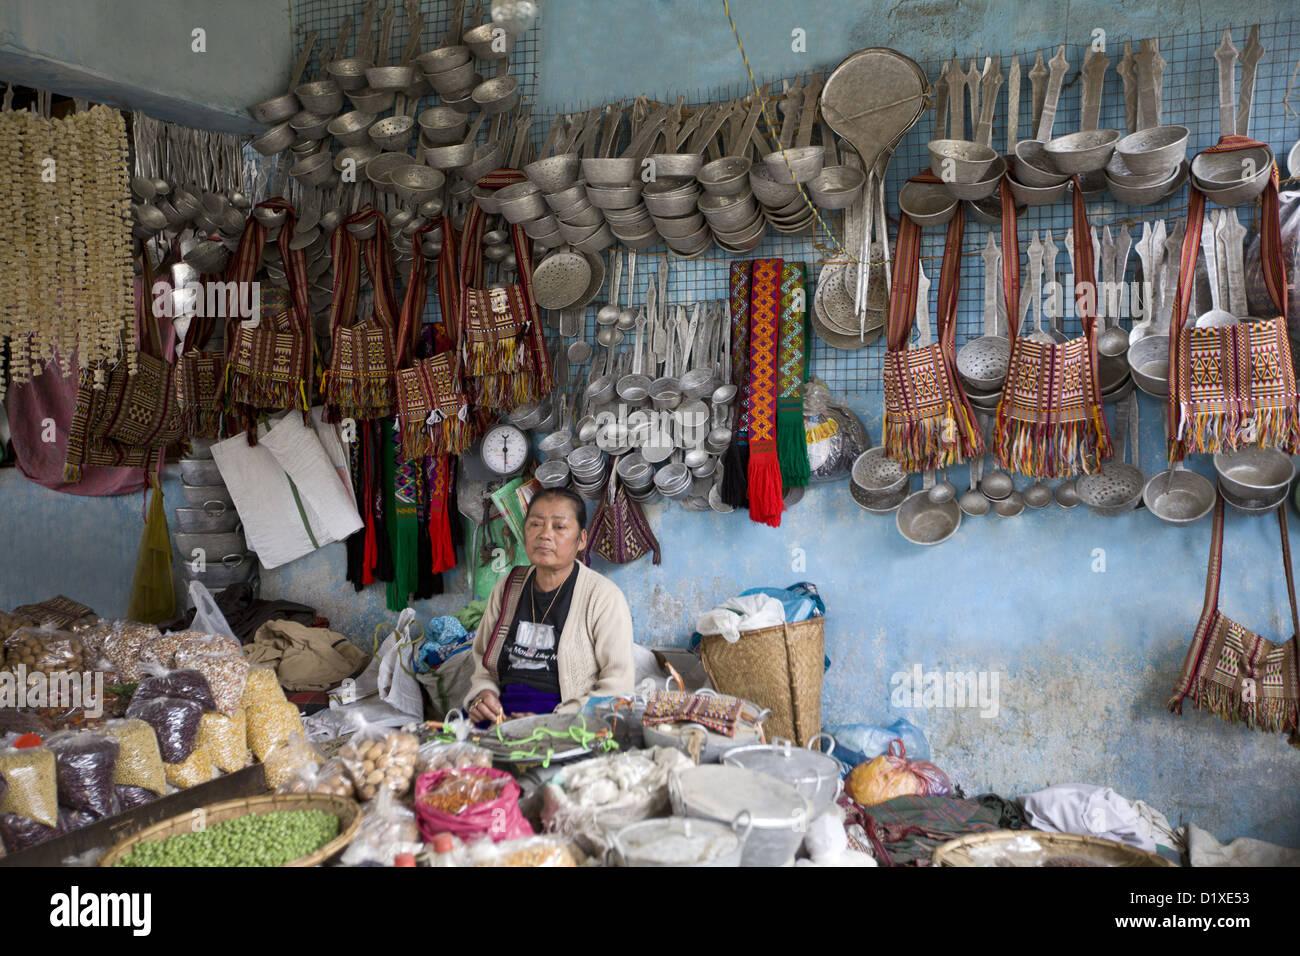 Lady selling vegetables and utensils. Bomdila bazaar, Arunachal Pradesh, India. - Stock Image